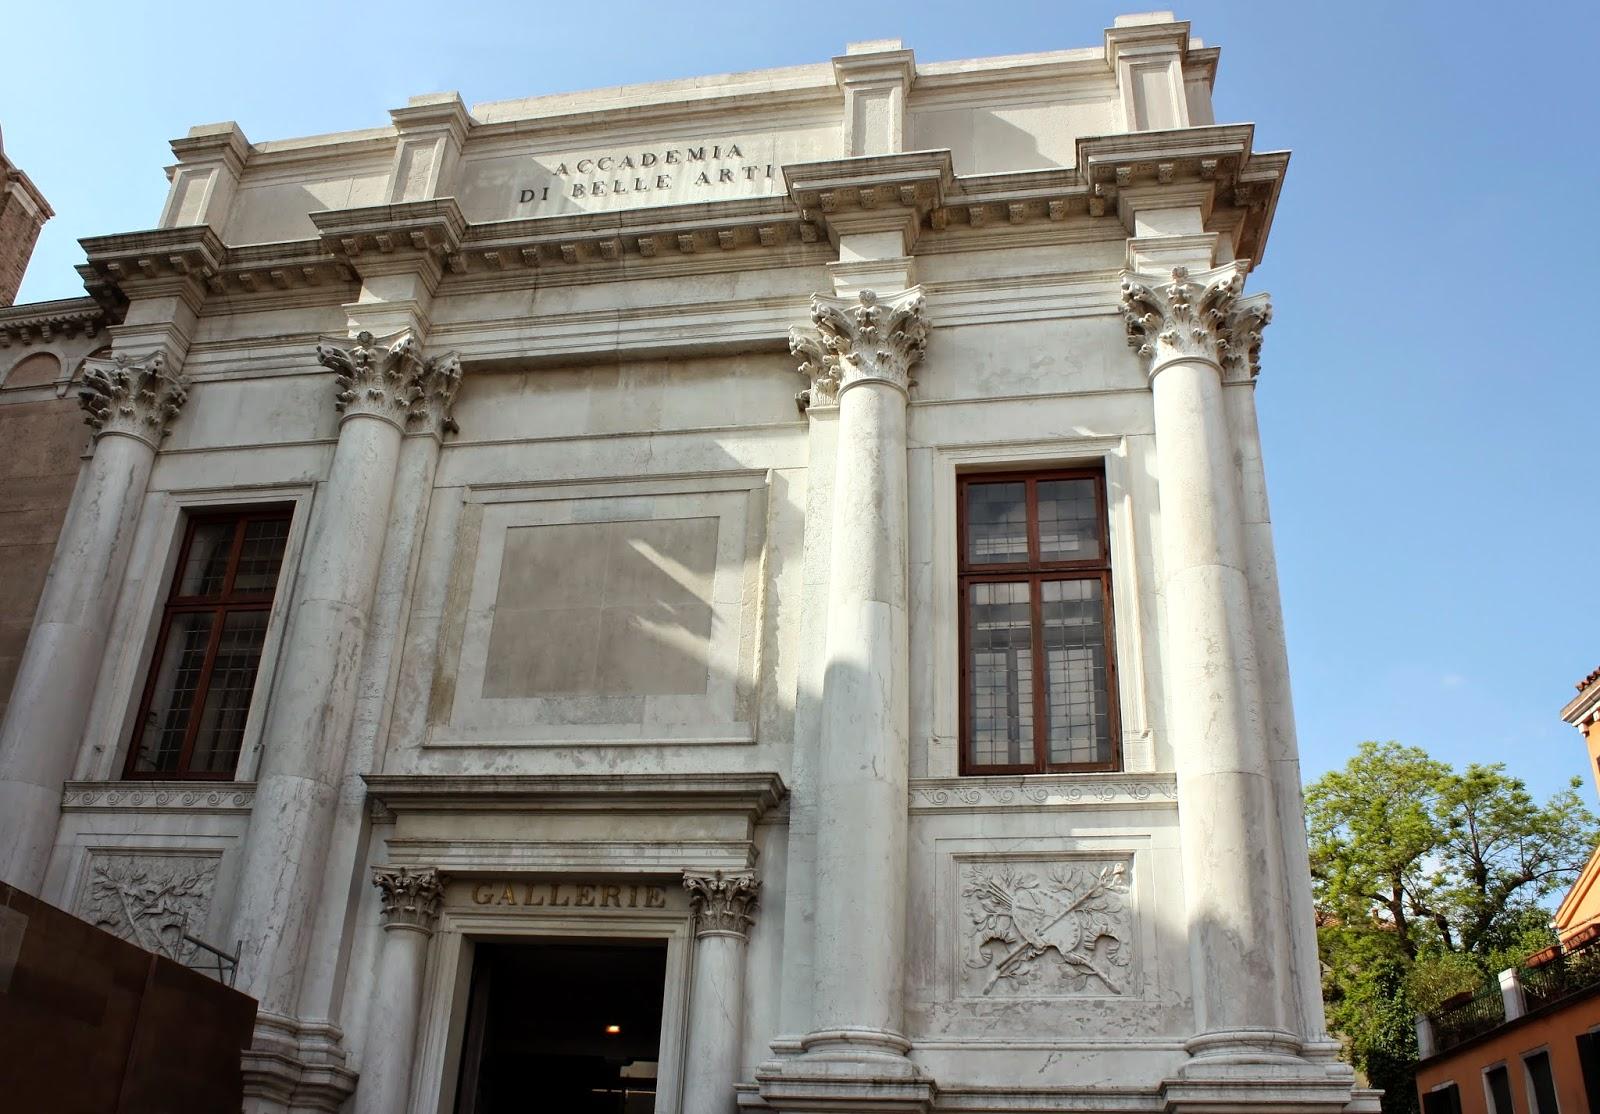 Gallerie dell' Accademia